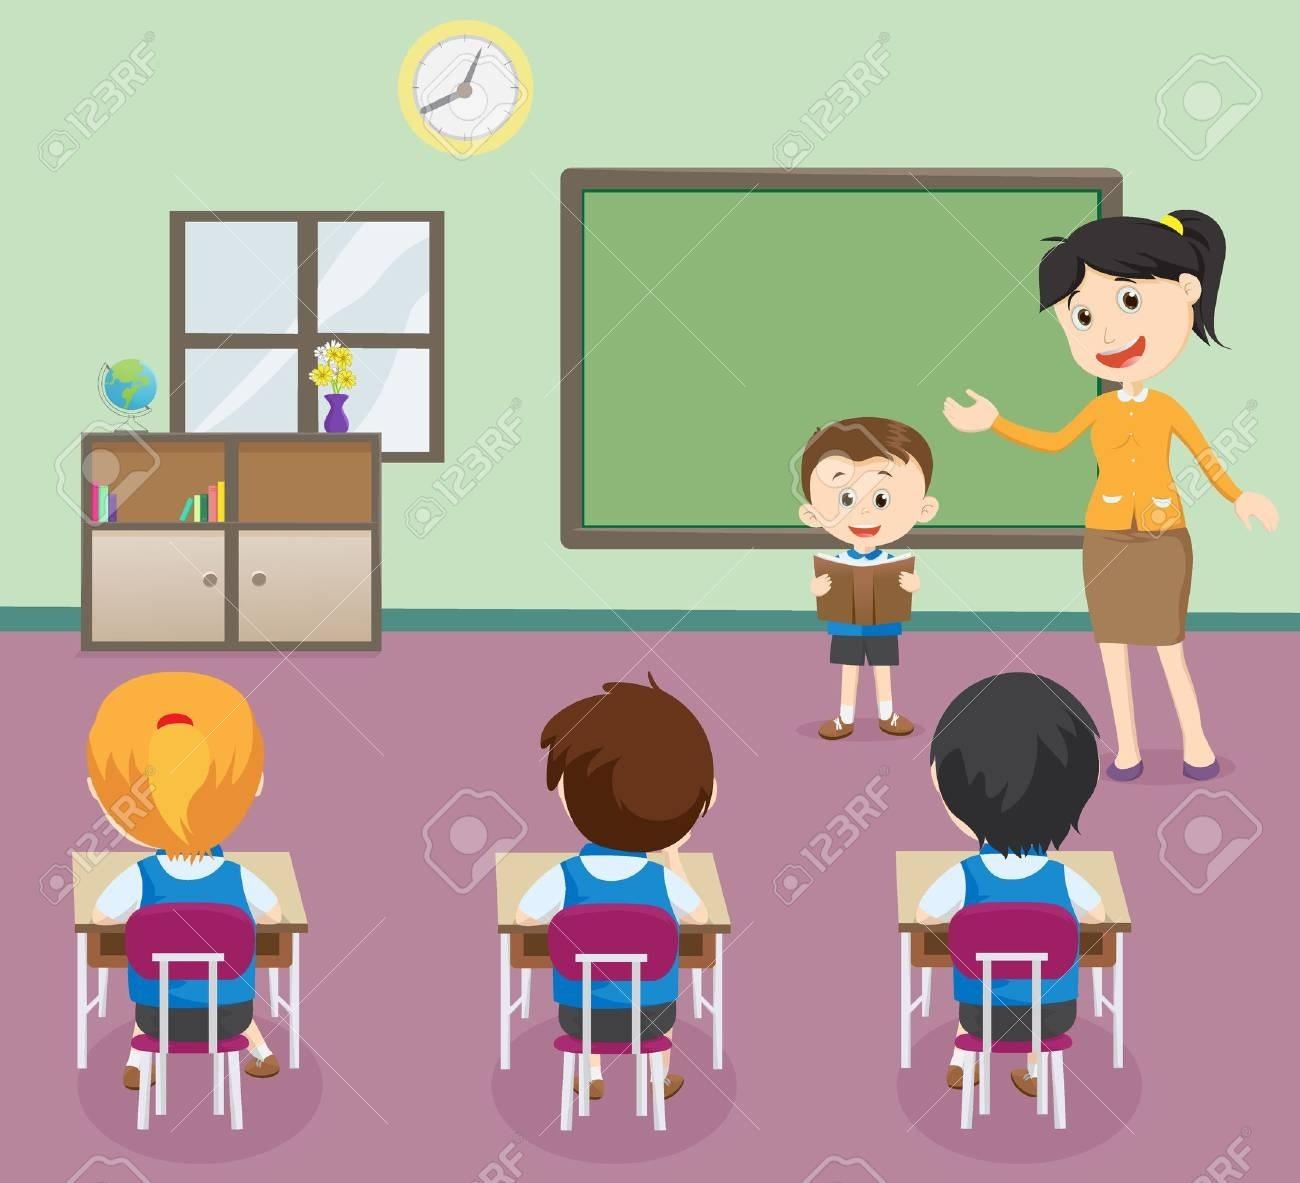 Google classroom clipart picture transparent download Classroom Clipart for download free – Free Clipart Images picture transparent download